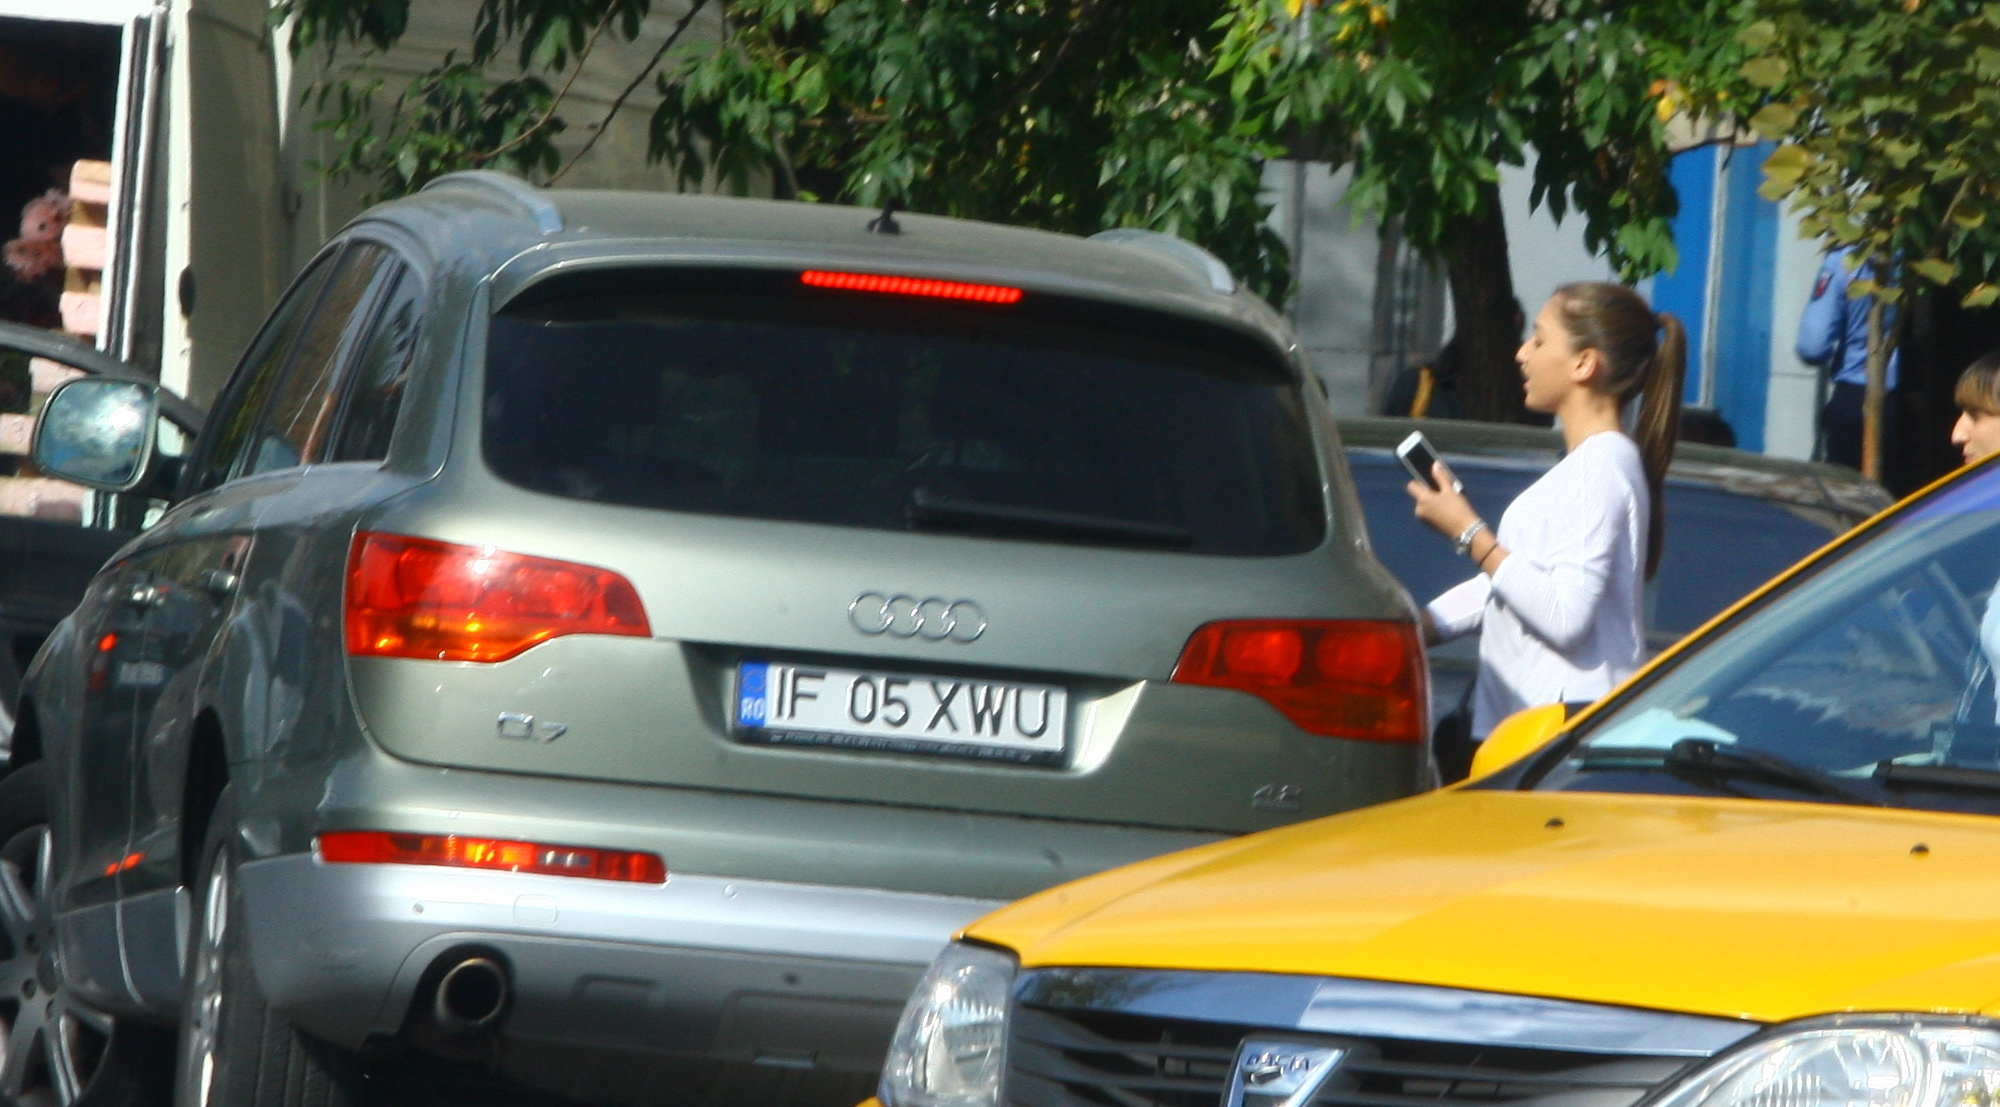 Fata a ajuns la masina si se urca linistita in automobil